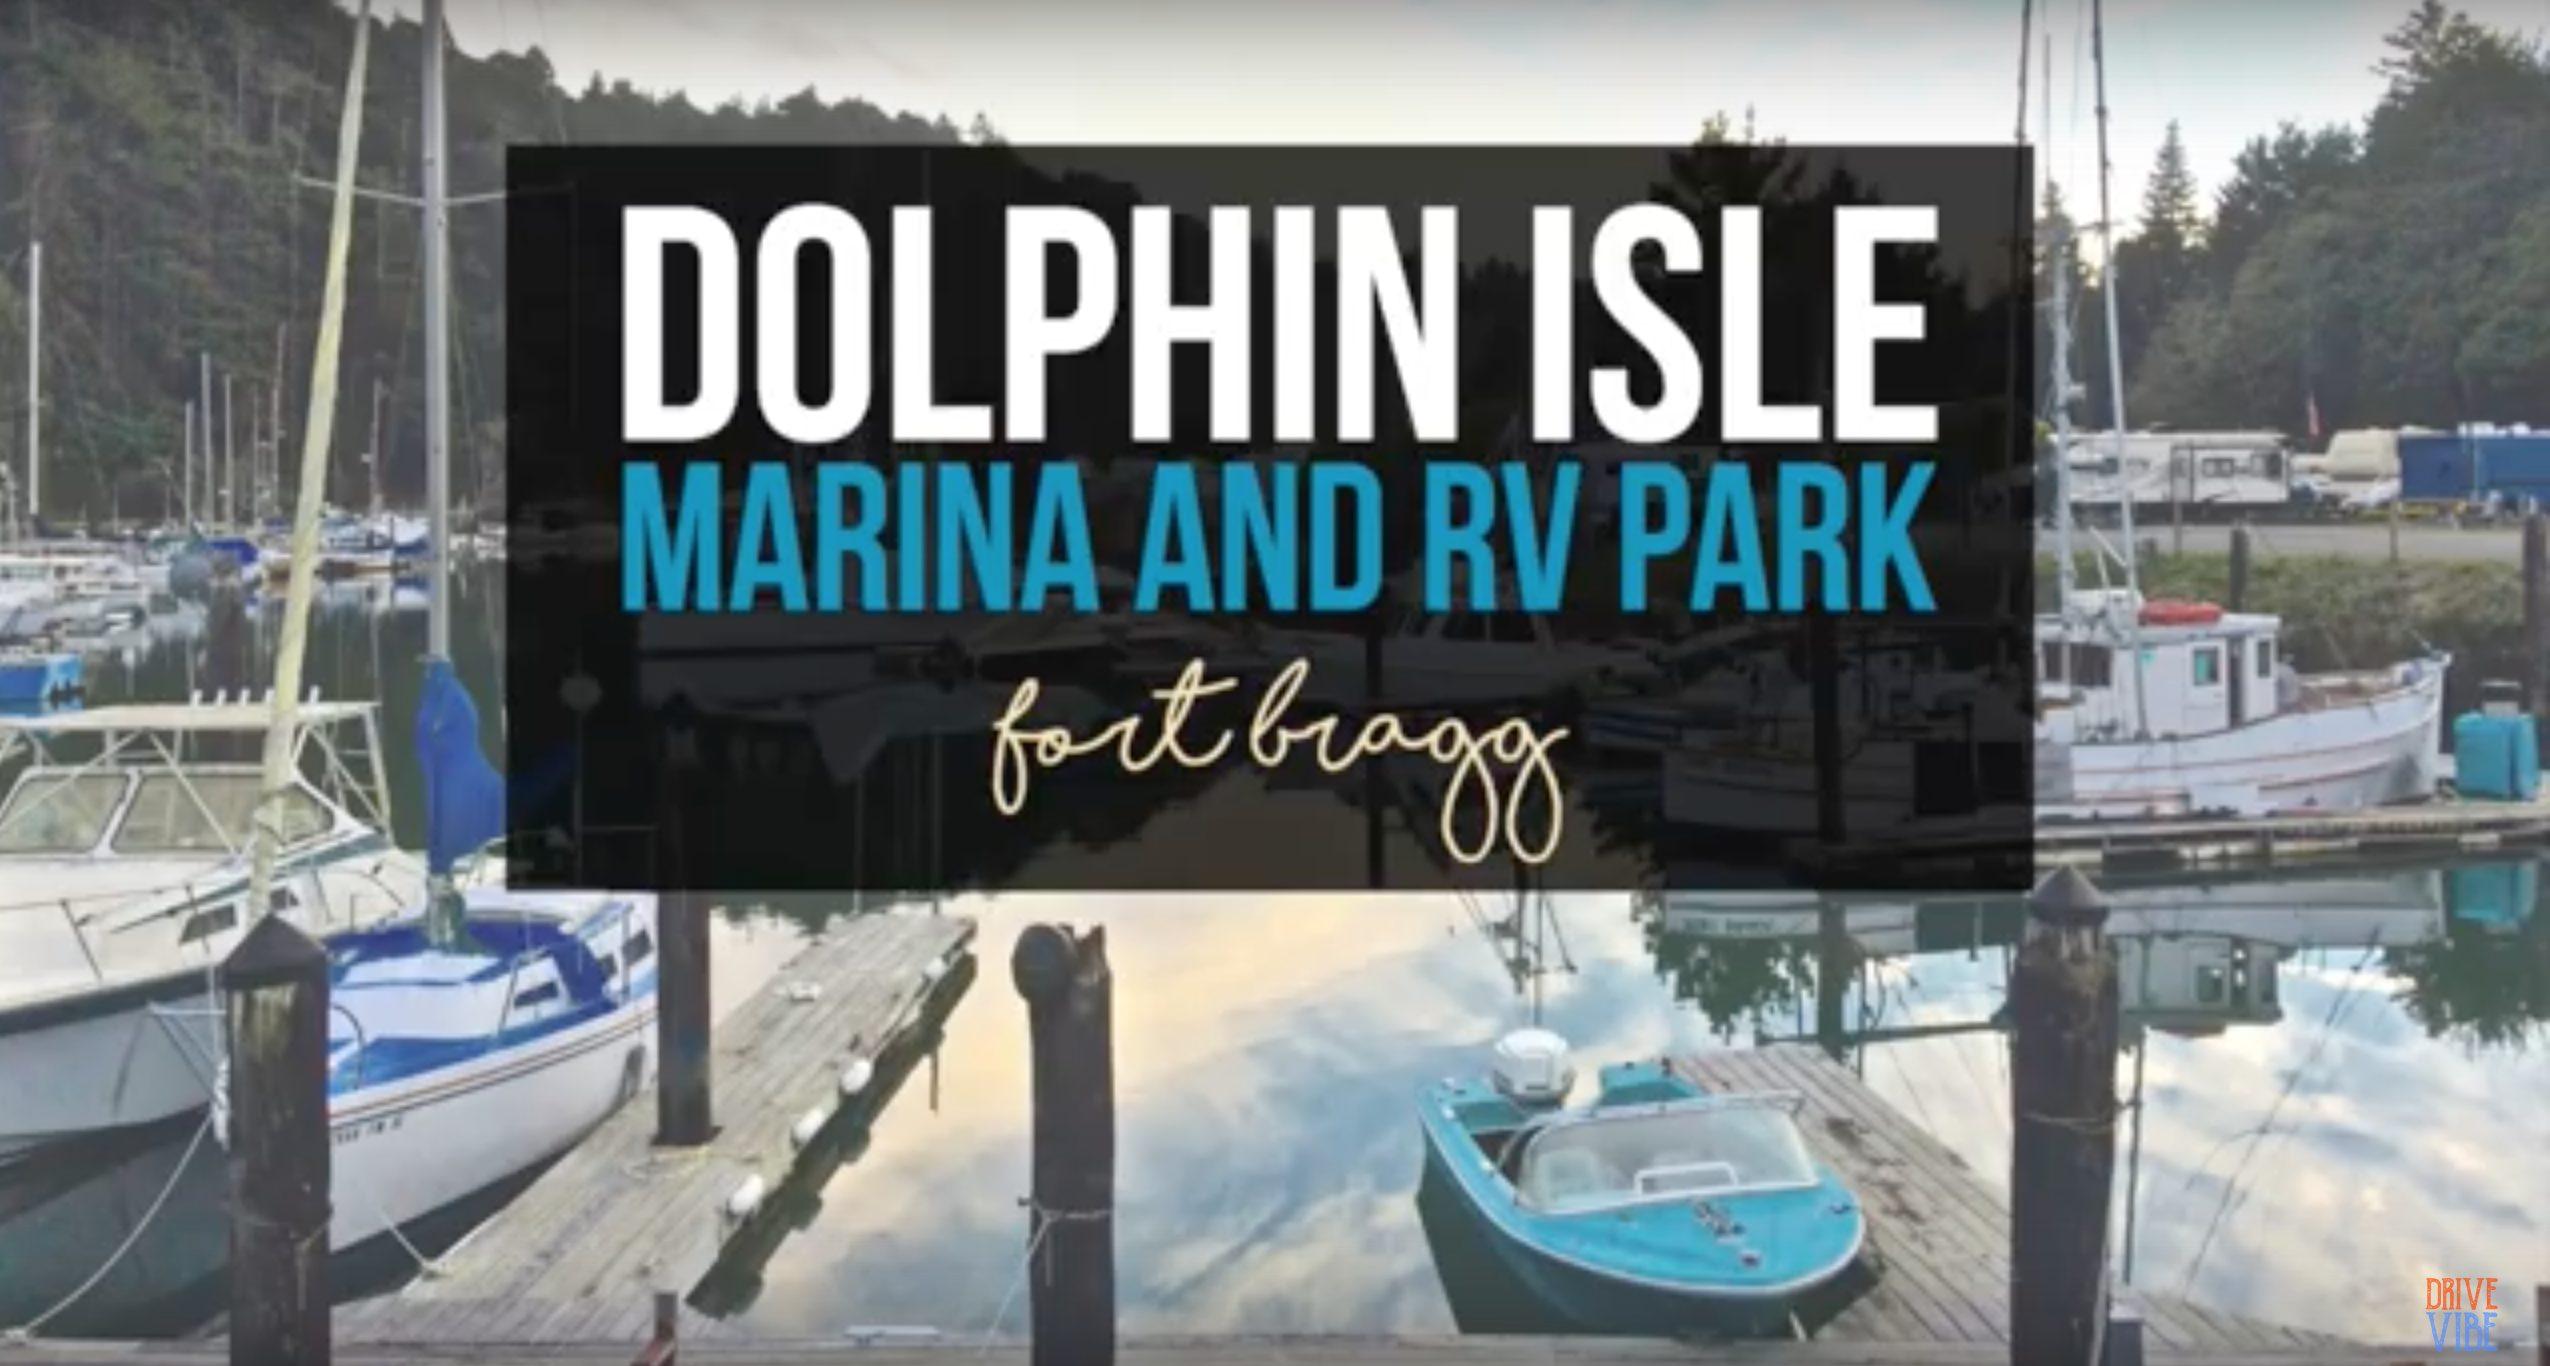 Dolphin Isle Marina & RV Park in Fort Bragg, California